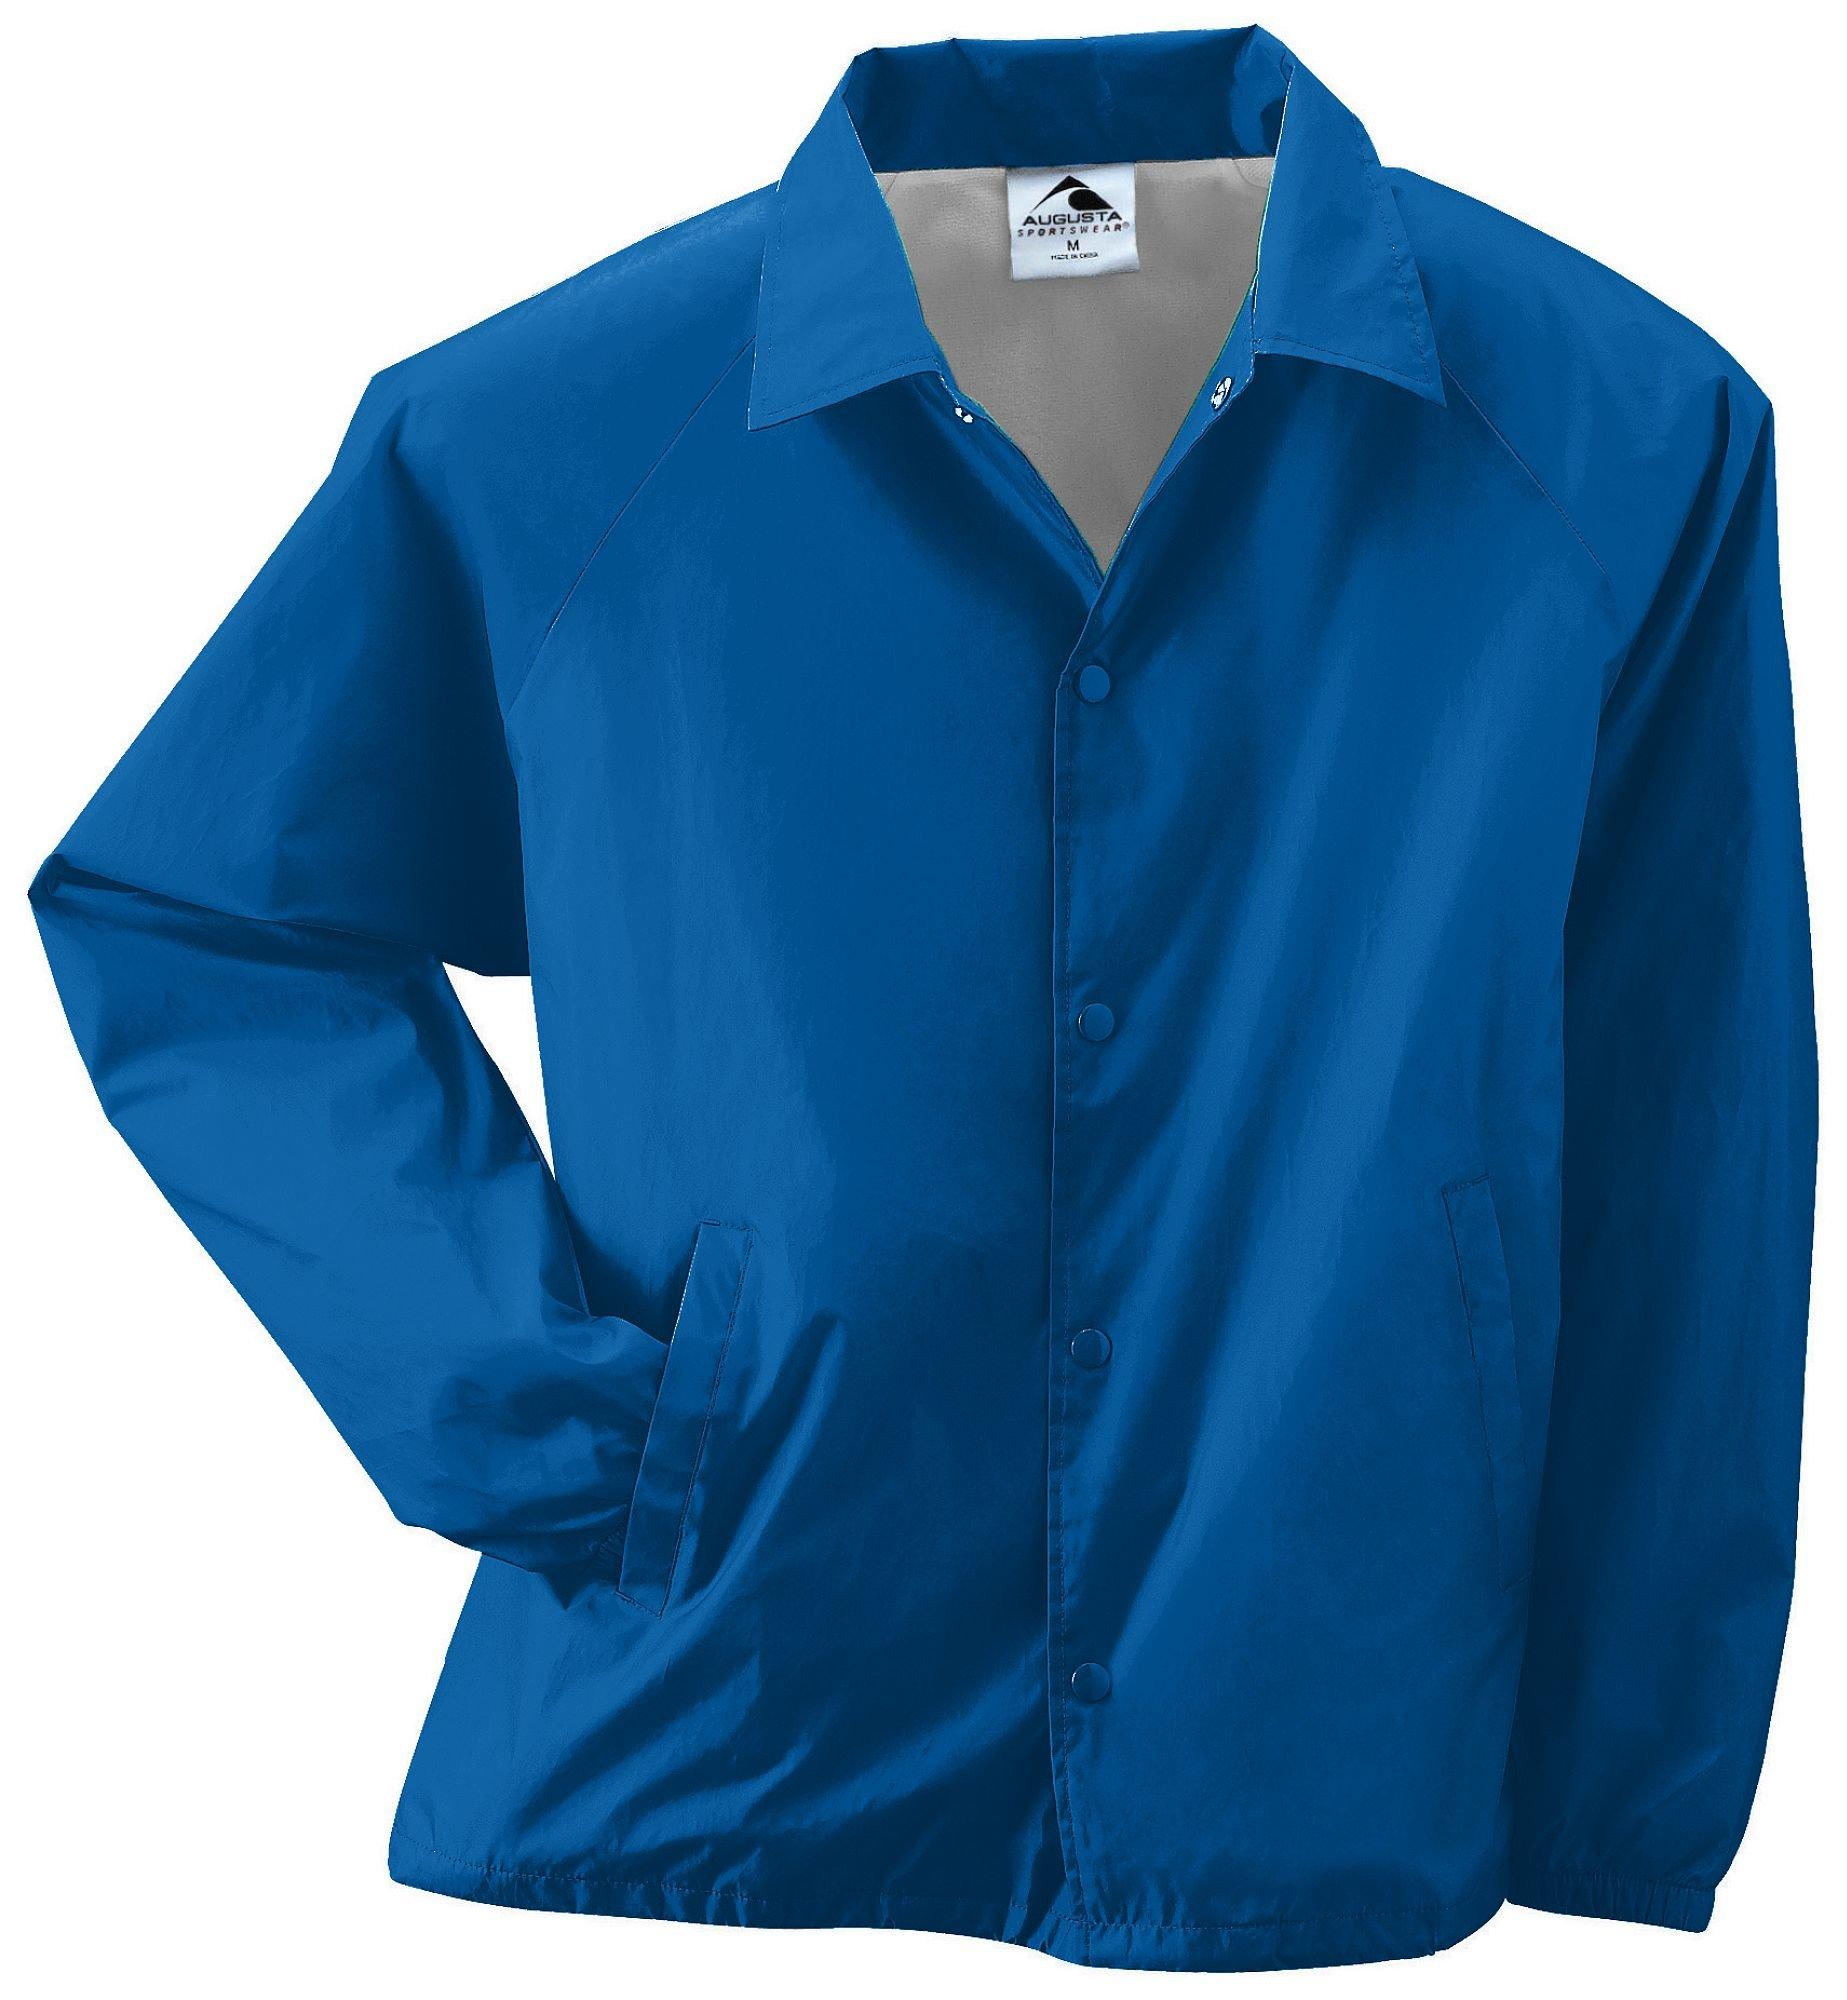 Augusta Sportswear Unisex-Adult Nylon Coach's Jacket/Lined, Royal, XX-Large